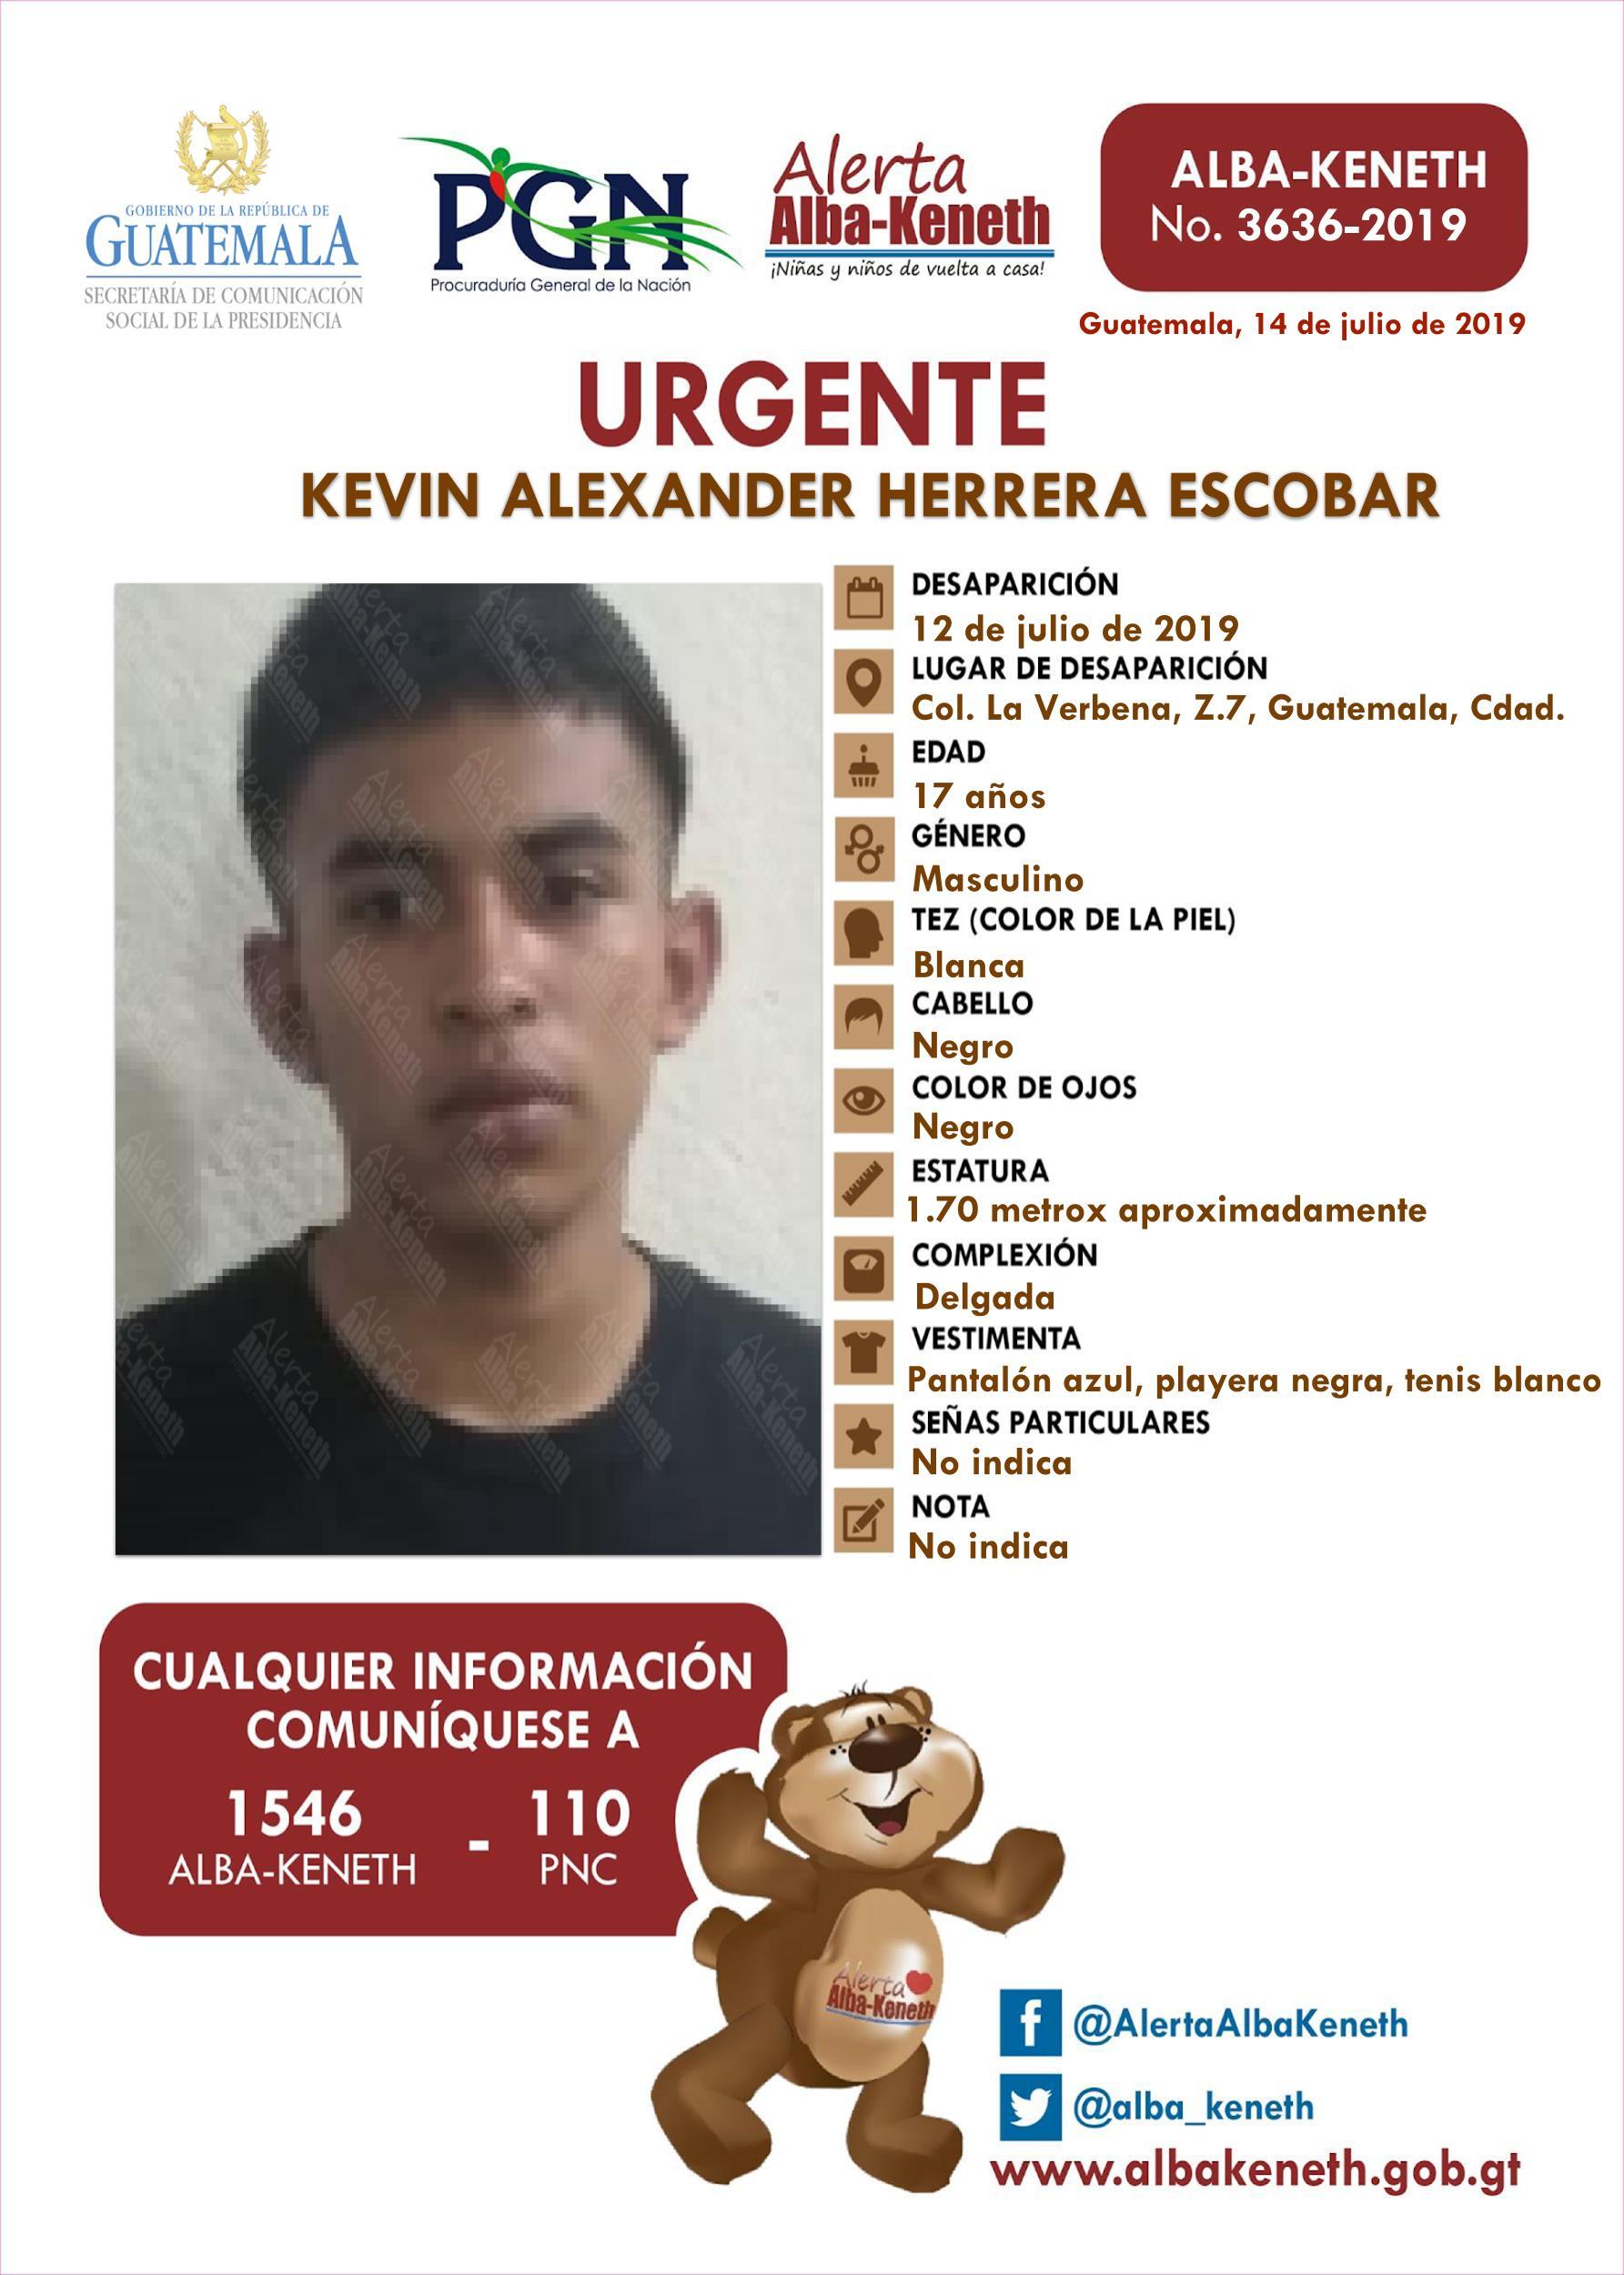 Kevin Alexander Herrera Escobar